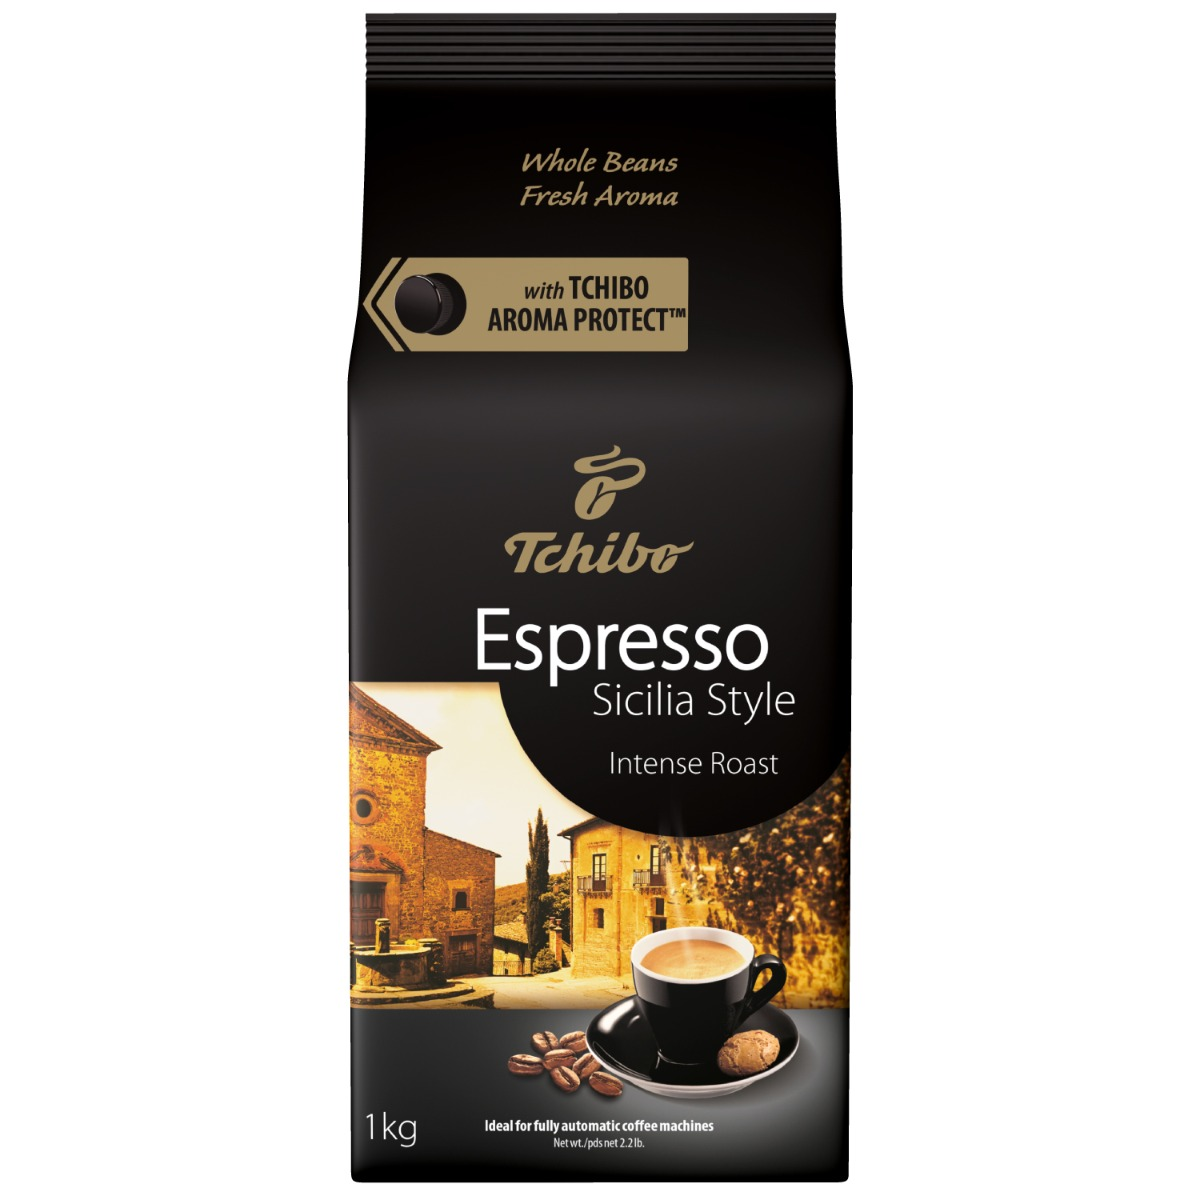 Cafea prajita boabe Tchibo Espresso Sicilia Style, 1 kg imagine